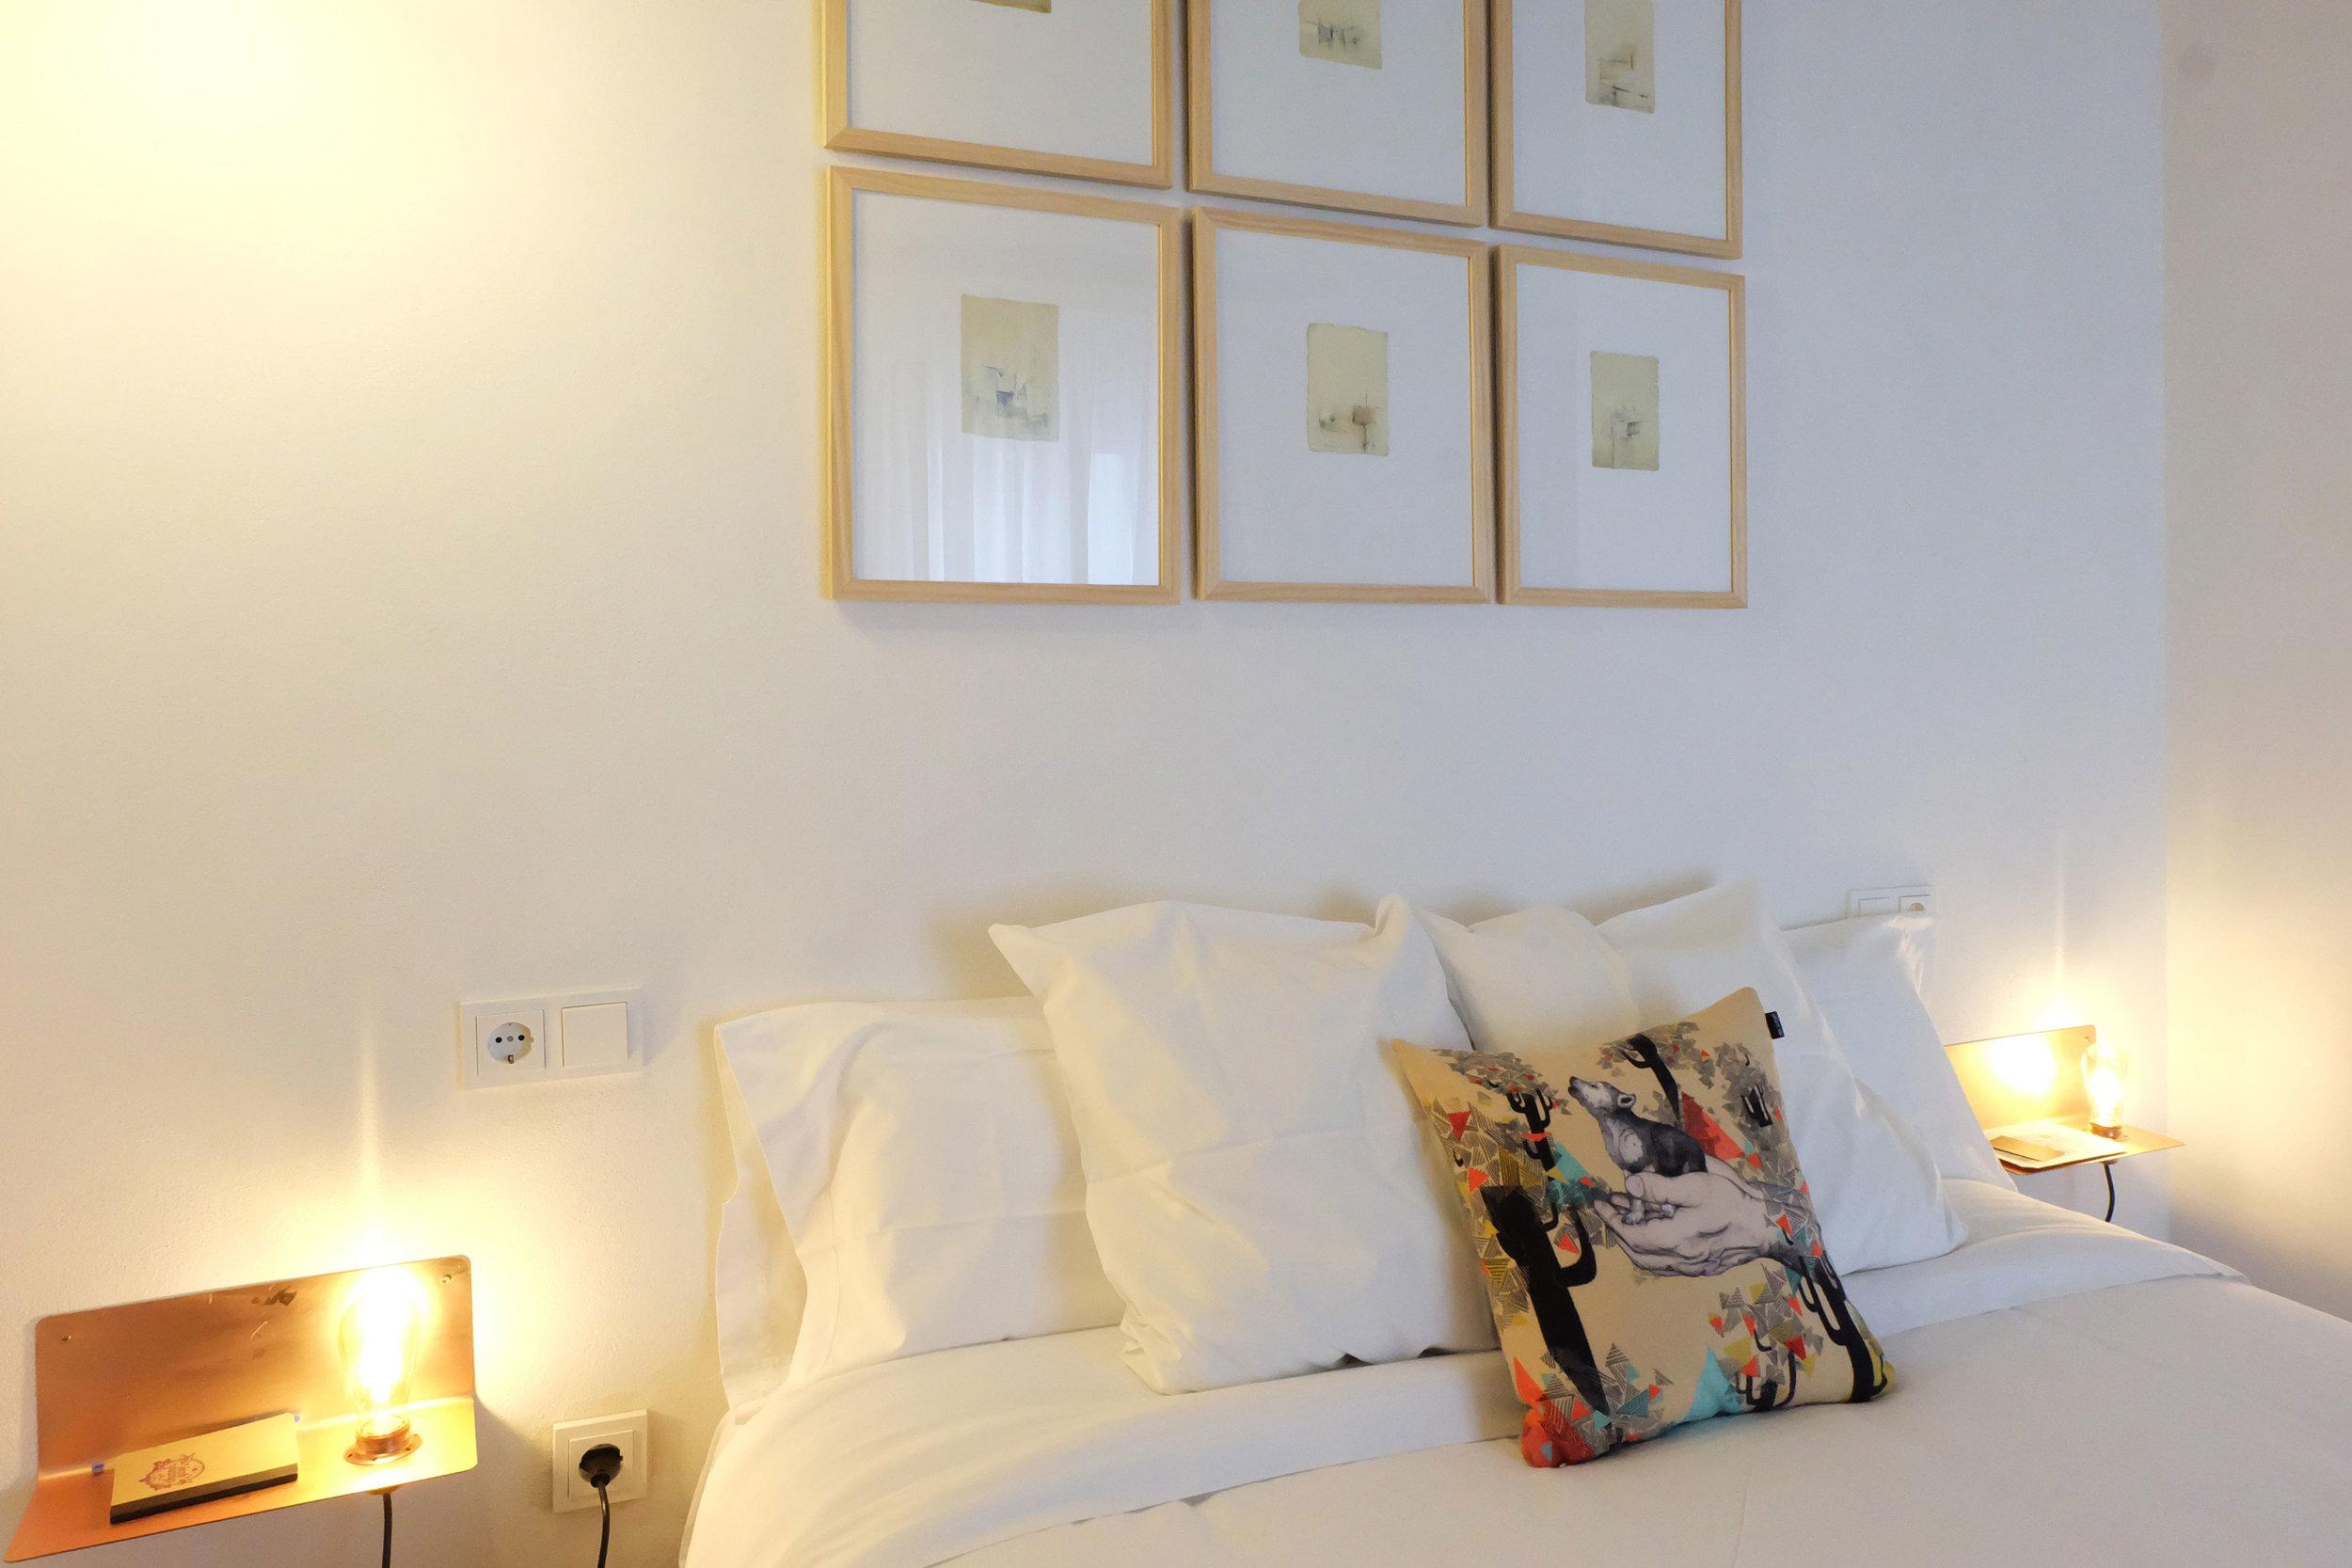 Hotel-Casa-de-Huespedes-Santa-Maria-Habitacion-10-16.jpg